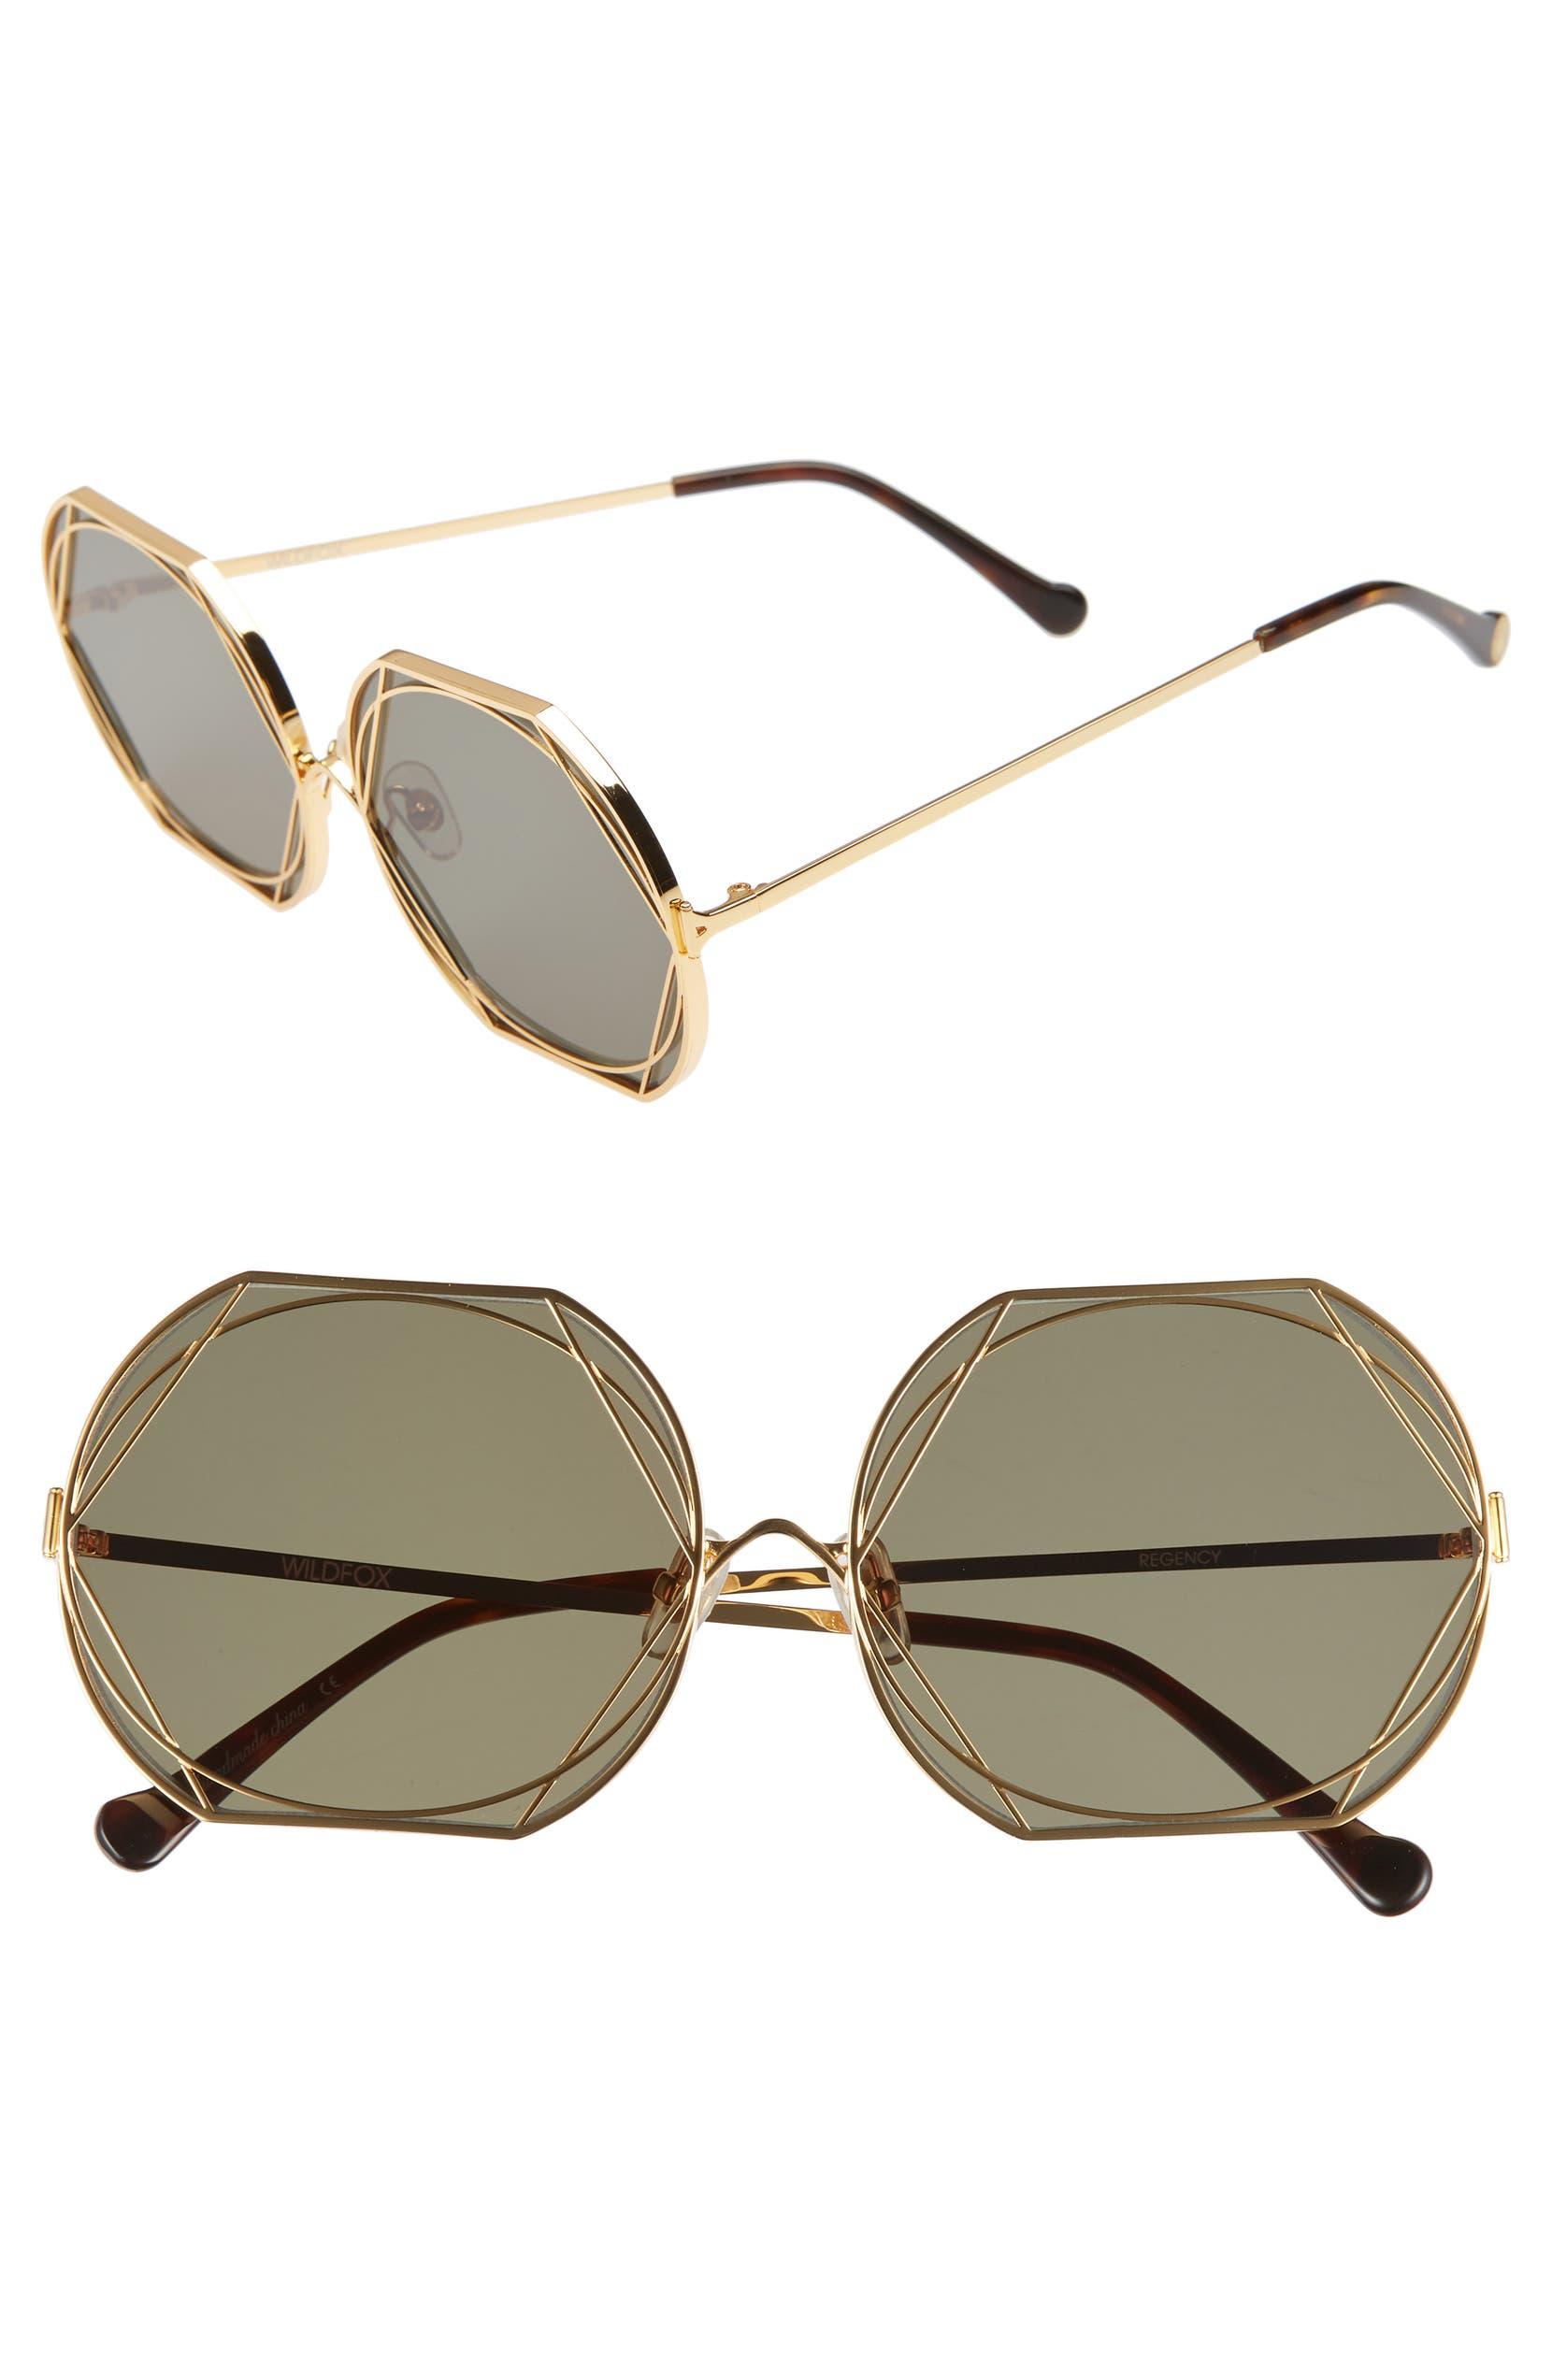 508c42d3755c8 Wildfox Regency Round 59mm Sunglasses